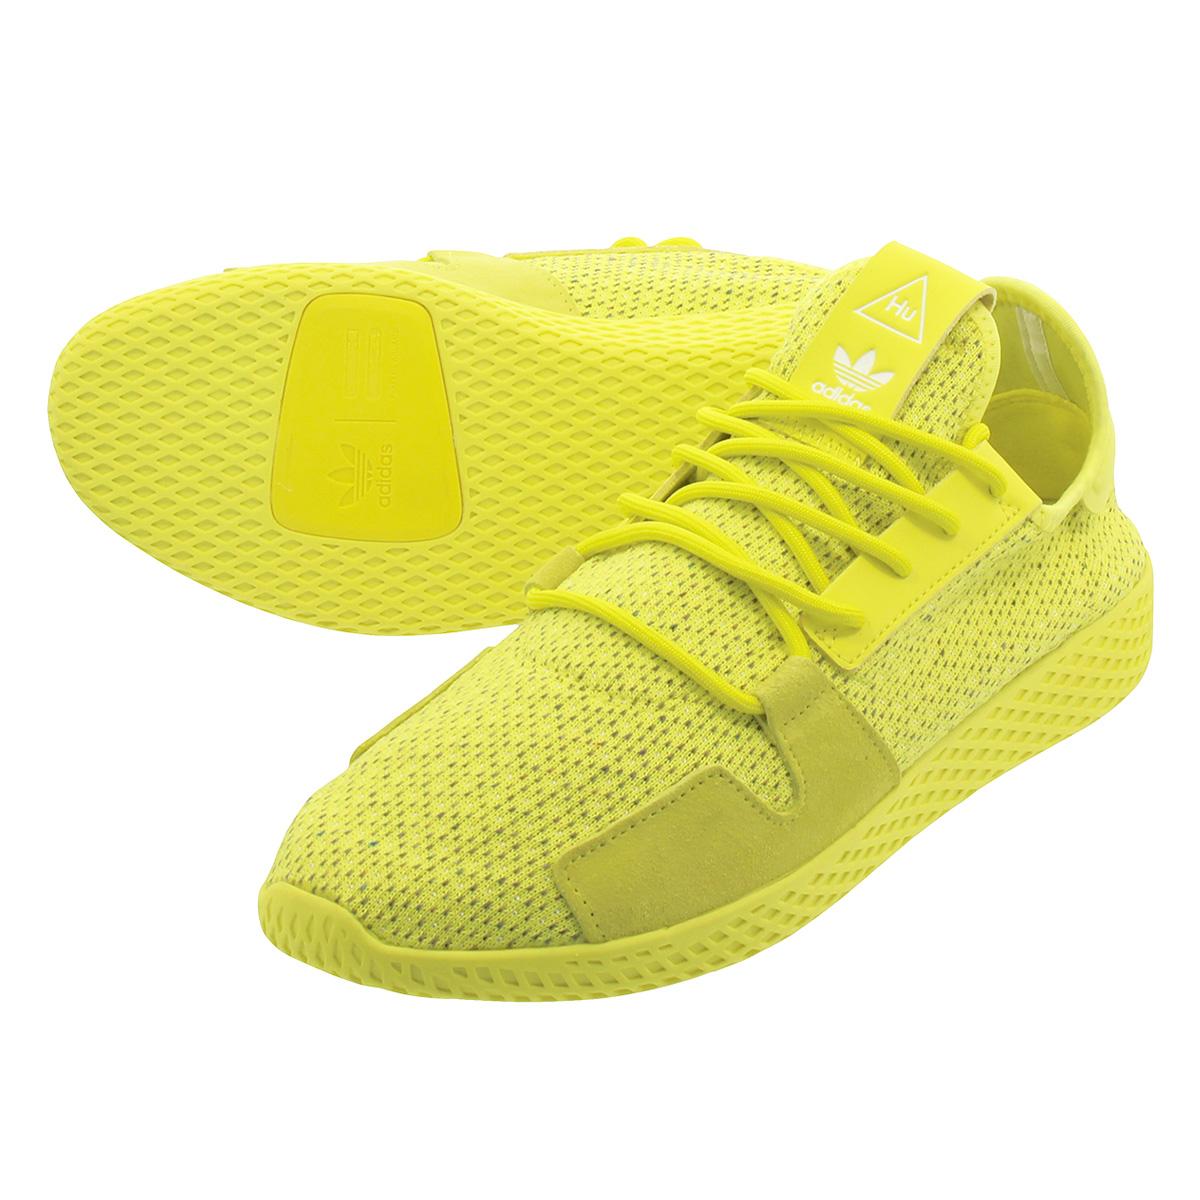 adidas PW TENNIS HU V2 【adidas Originals x PHARRELL WILLIAMS】 アディダス ファレル ウィリアムス テニス HU V2 SHOCK YELLOW/SHOCK YELLOW/RUNNING WHITE db3329